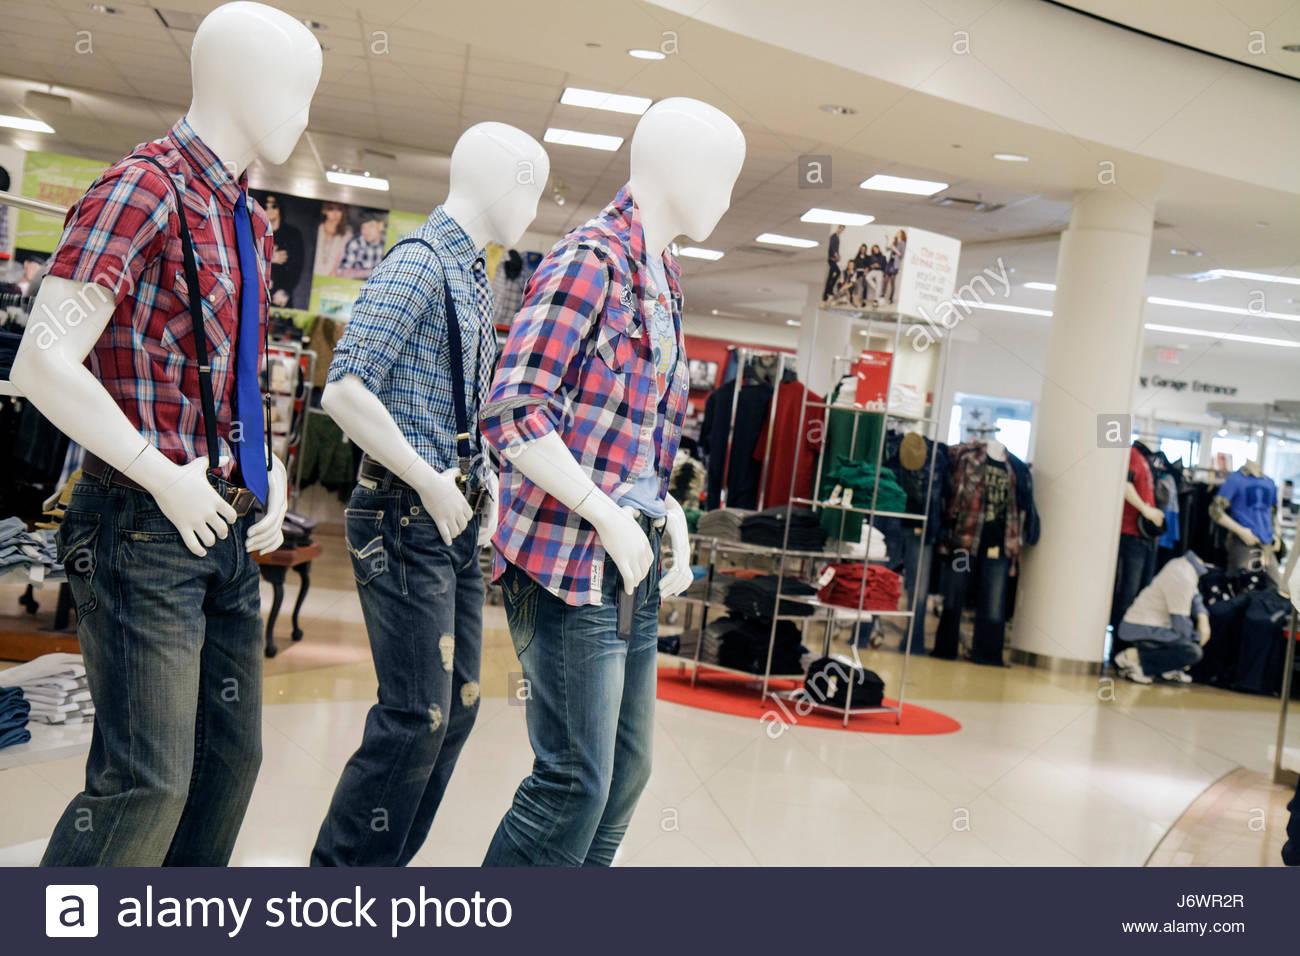 Www macy clothing store com